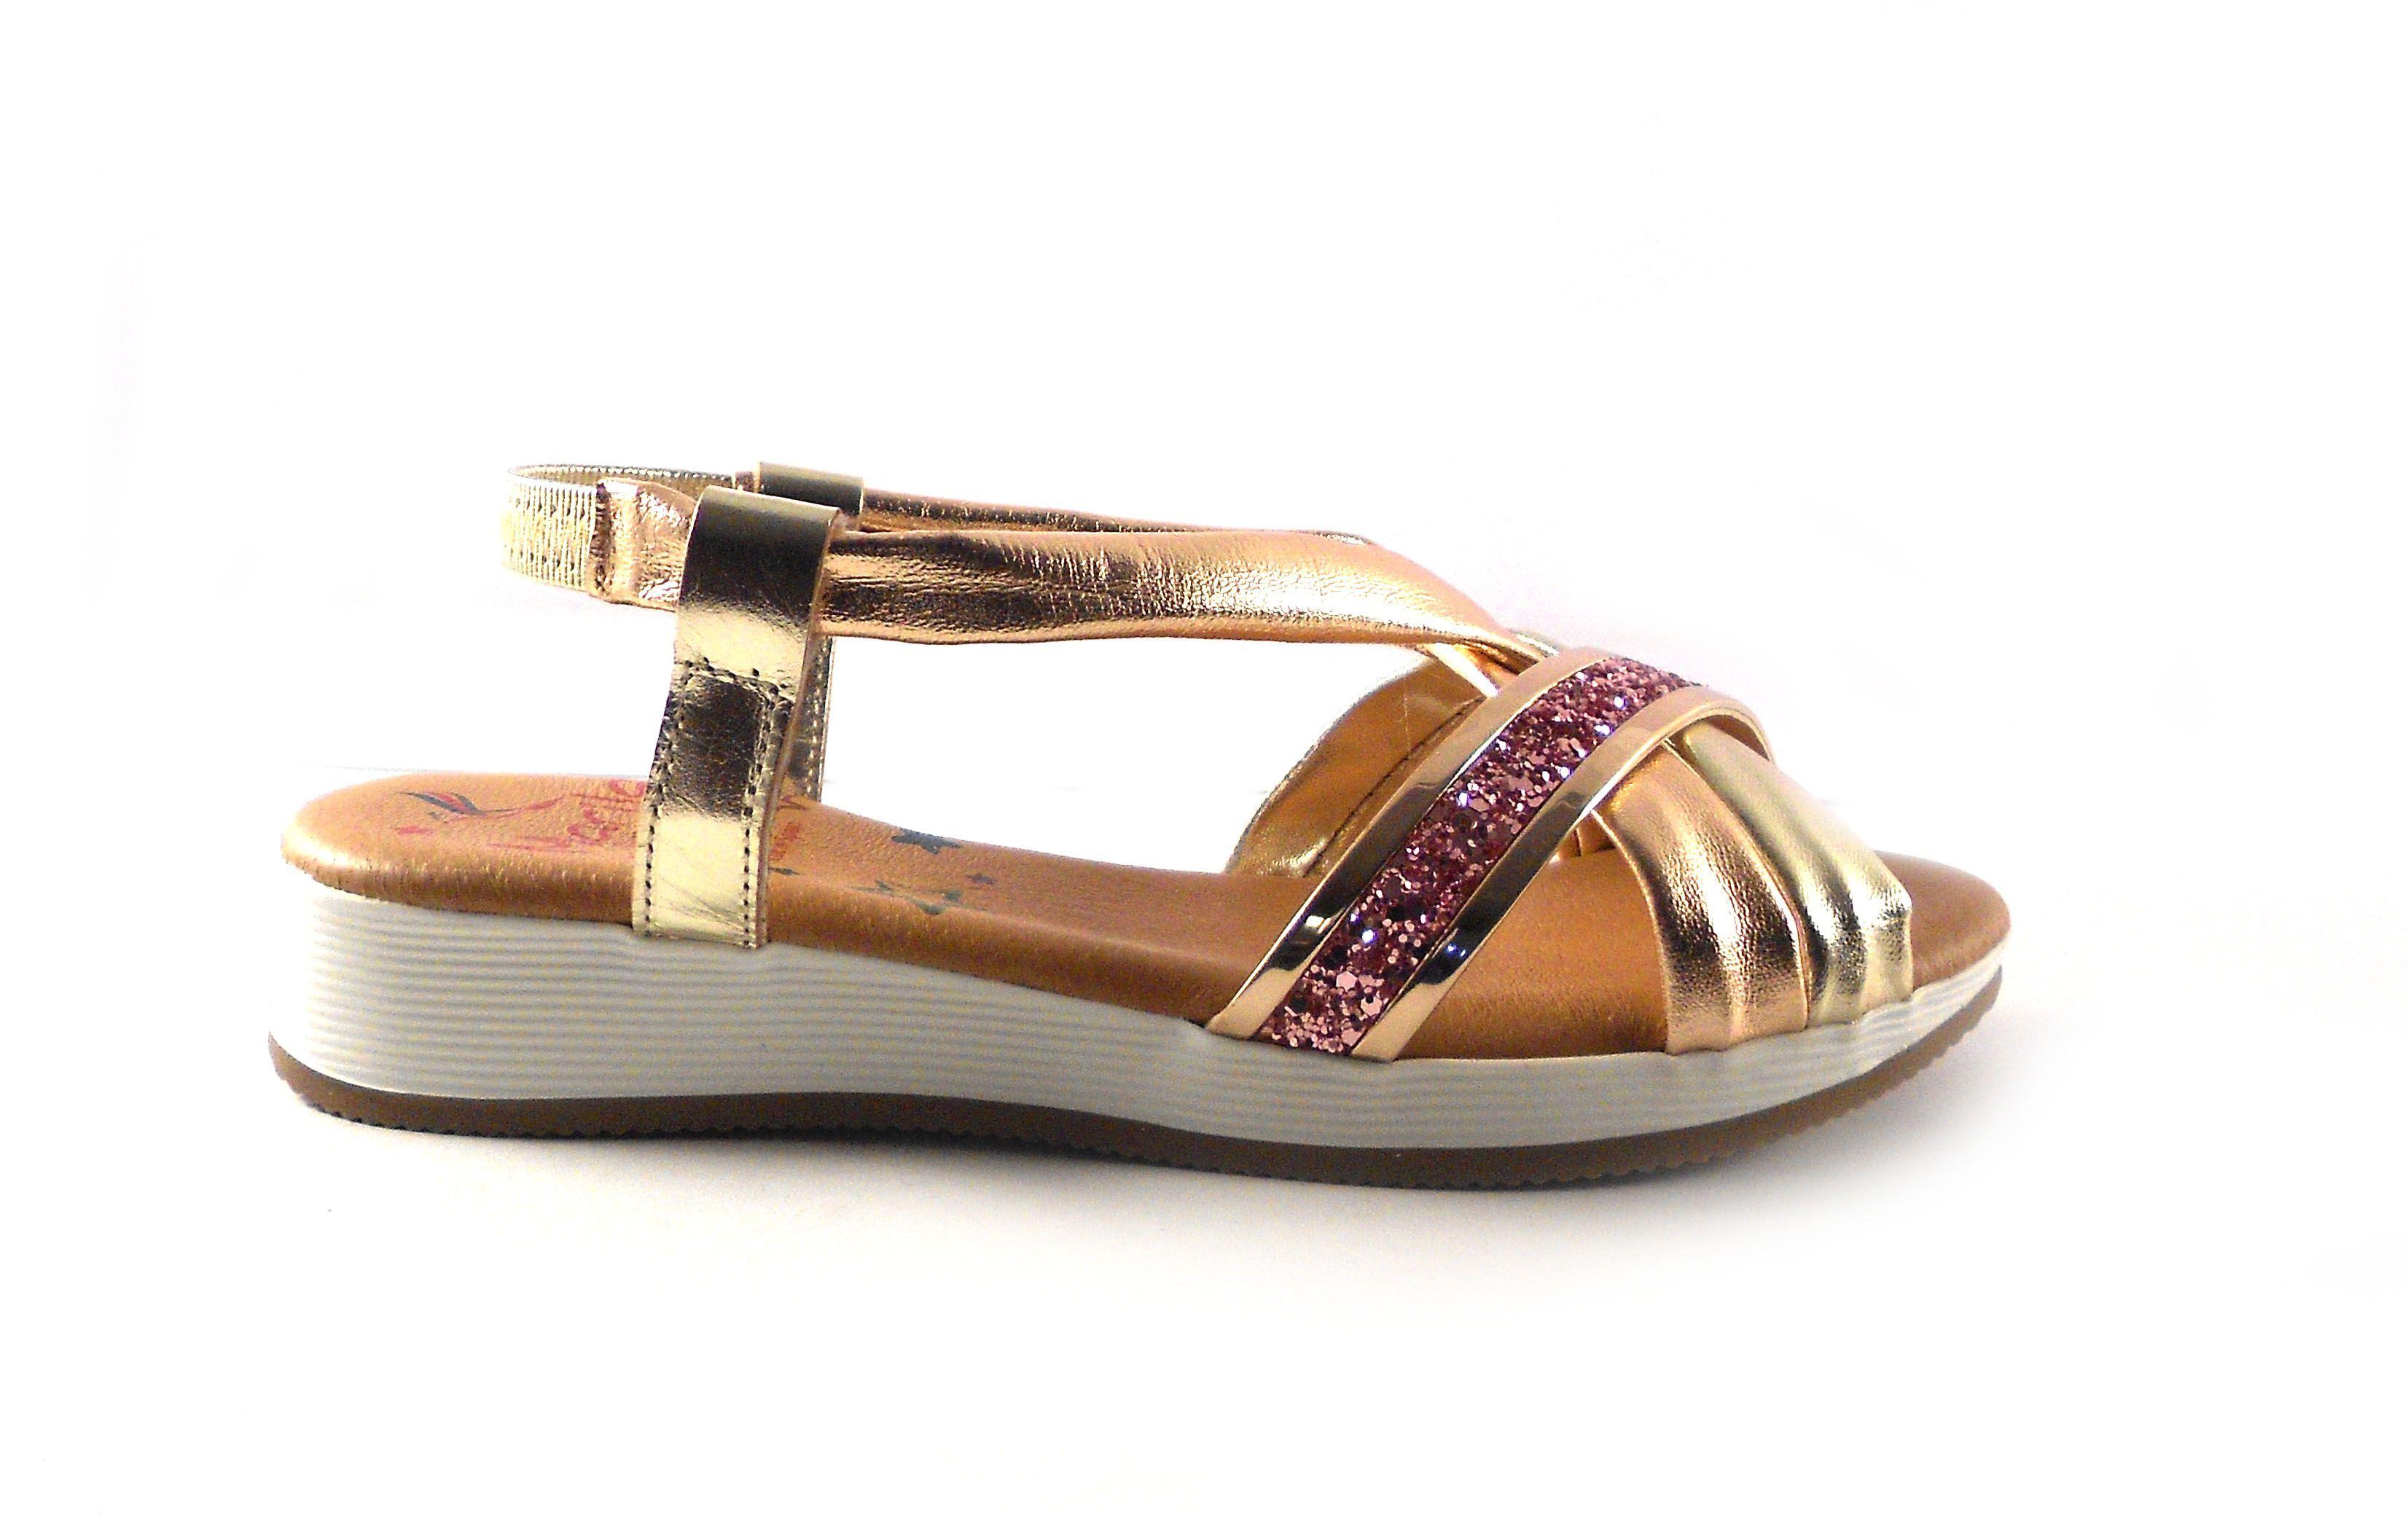 Marila Sandalias De Doradas Shoes Rosa En Glitter Tiras Piel Con Planas 53q4RjcLA